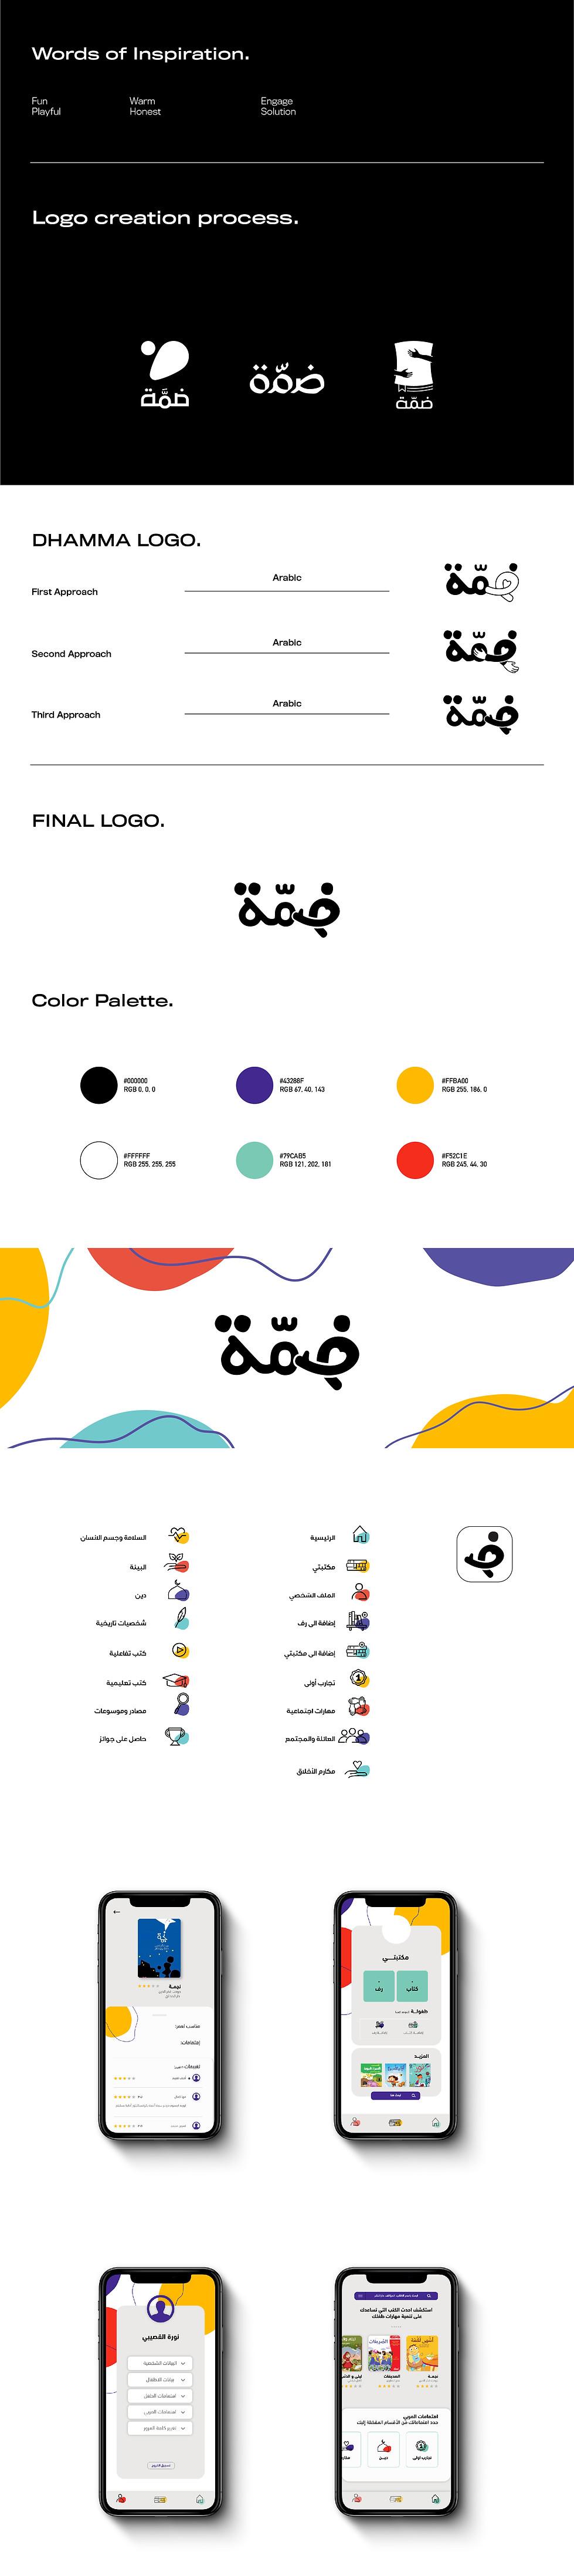 Dhamma | Process-01.jpg